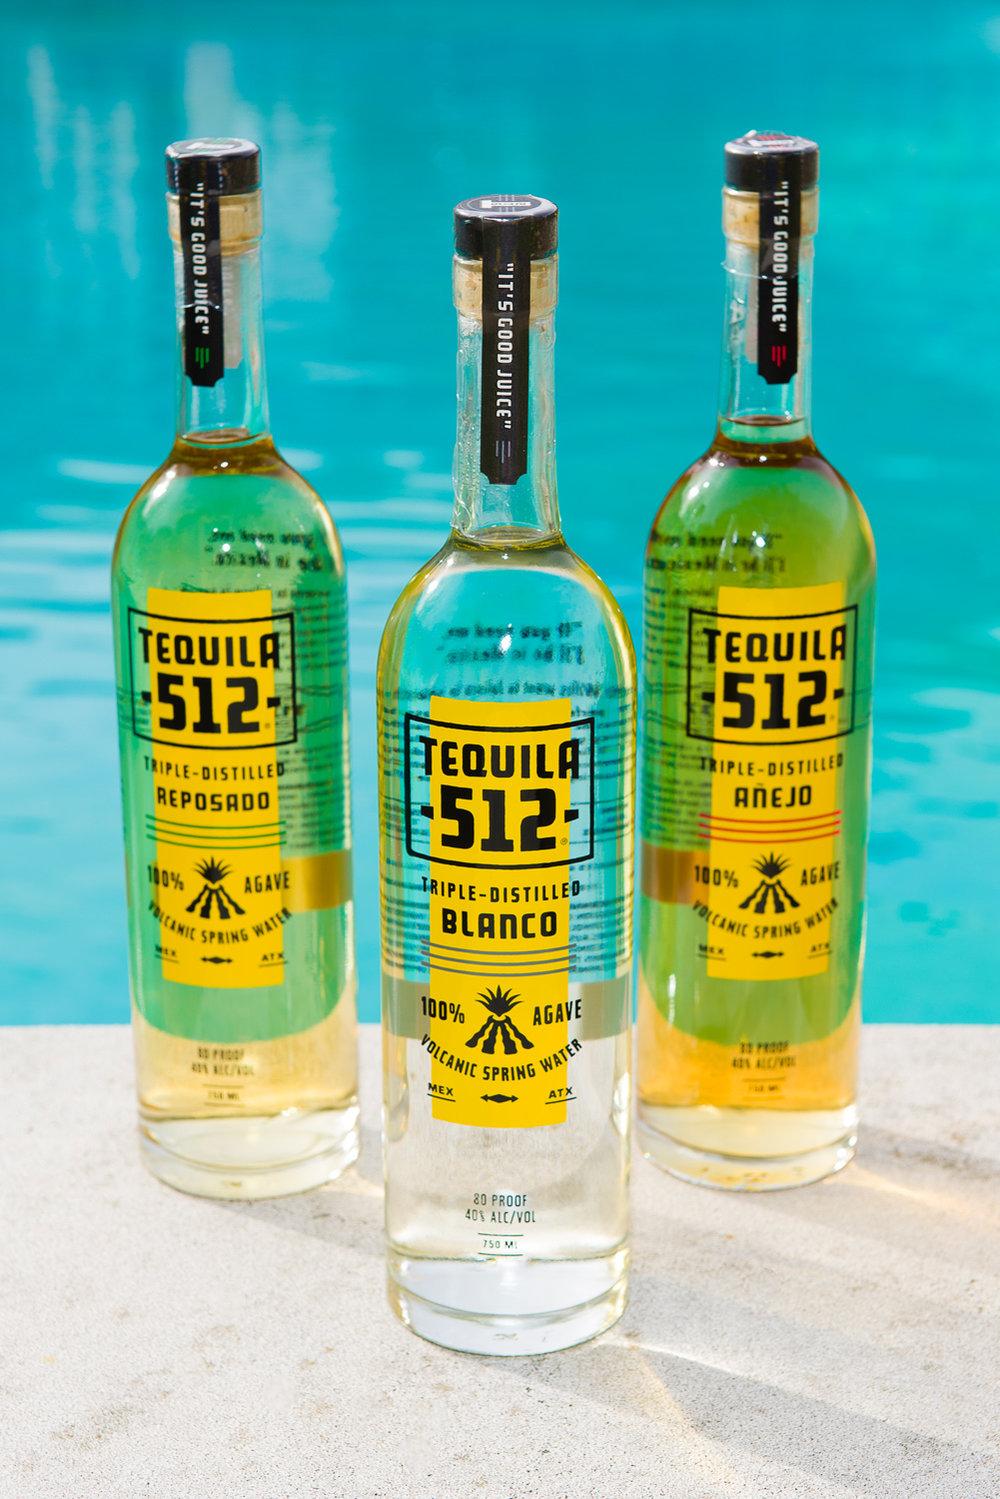 Tequila 512 - foundingAustin magazine 2.jpg